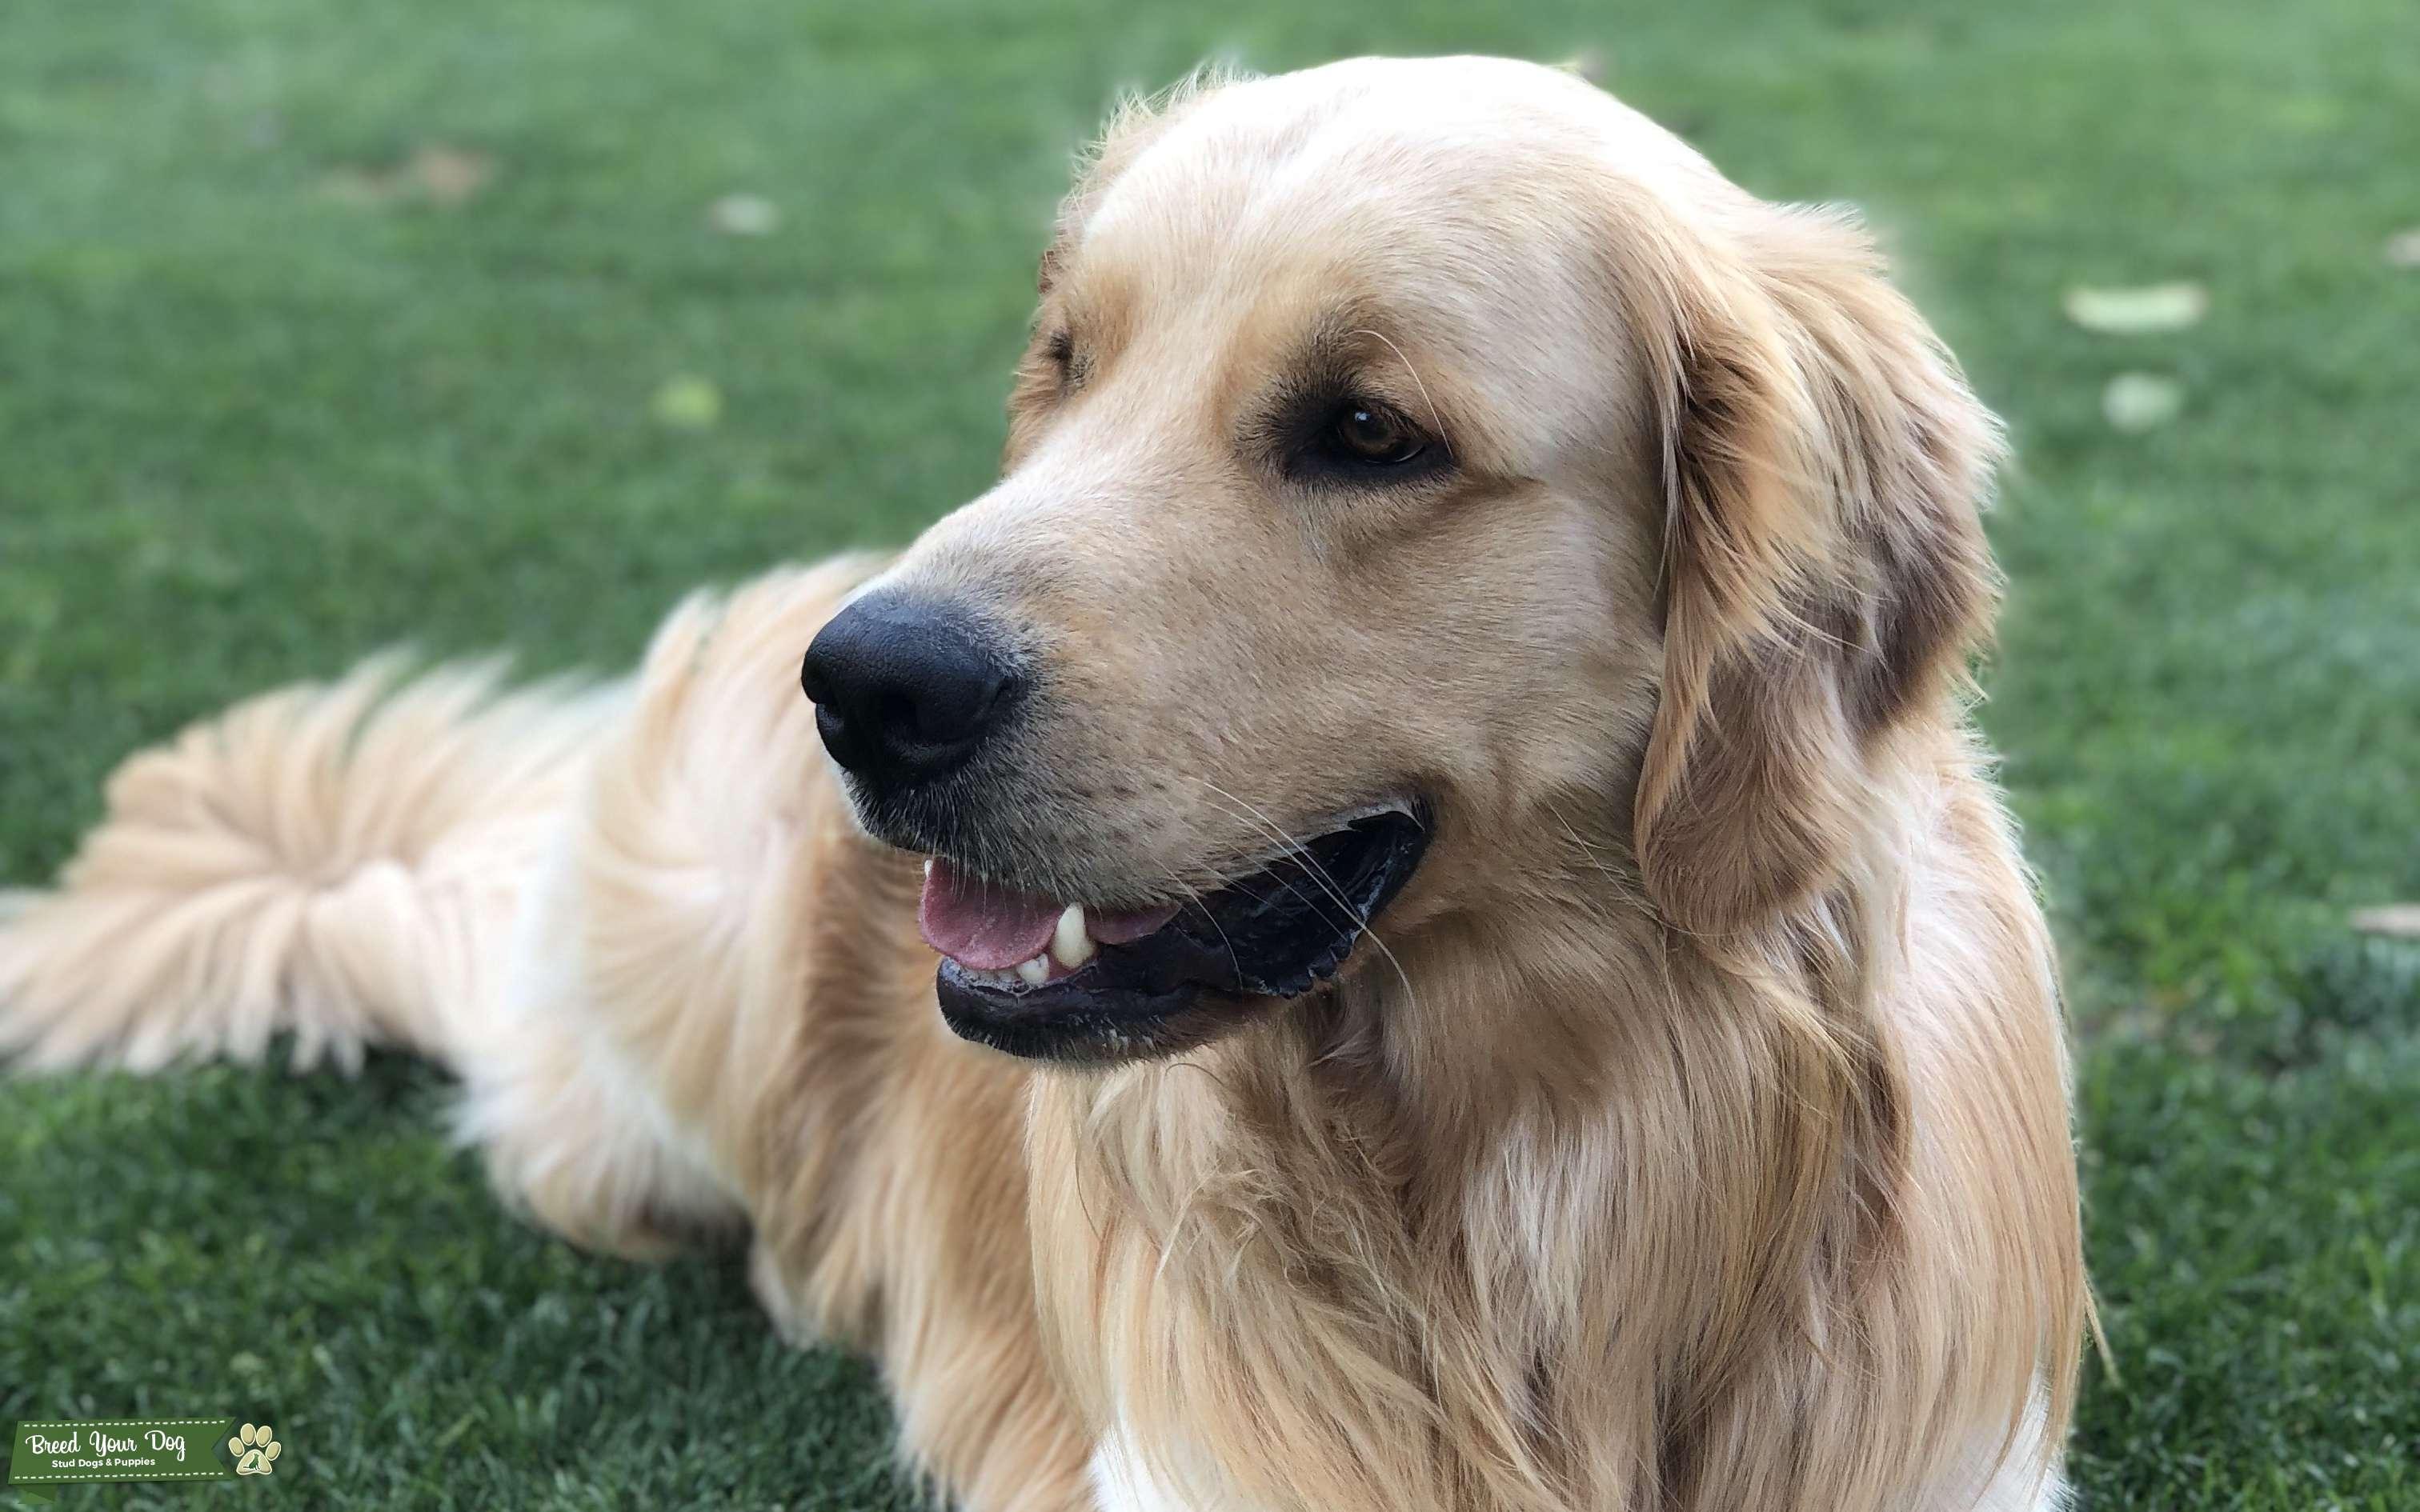 Stud Dog Akc Golden Retriever Breed Your Dog